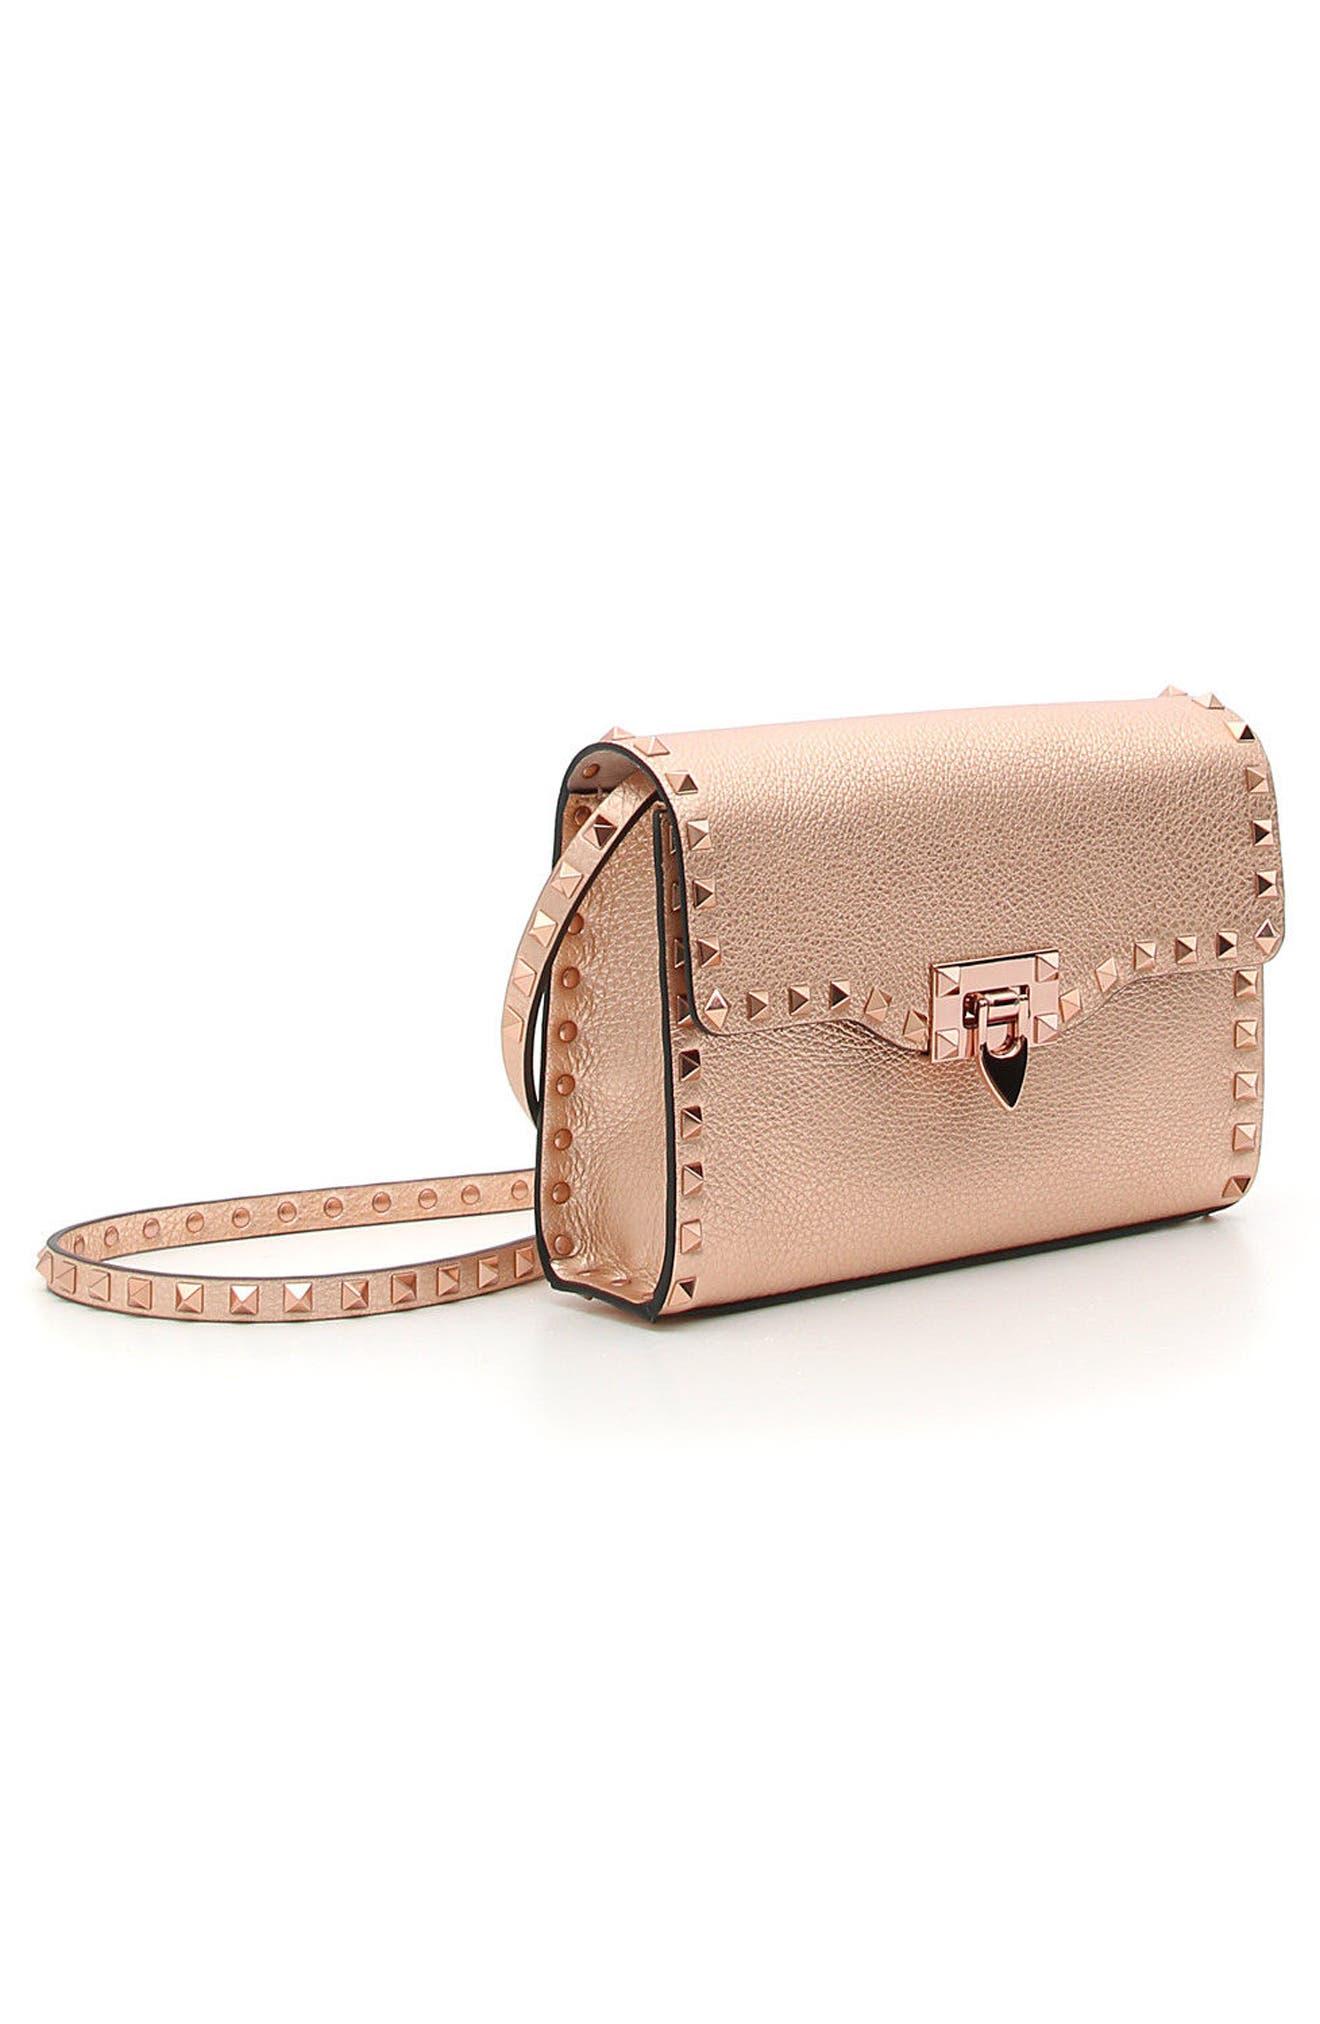 Rockstud Medium Metallic Leather Shoulder Bag,                             Alternate thumbnail 3, color,                             682